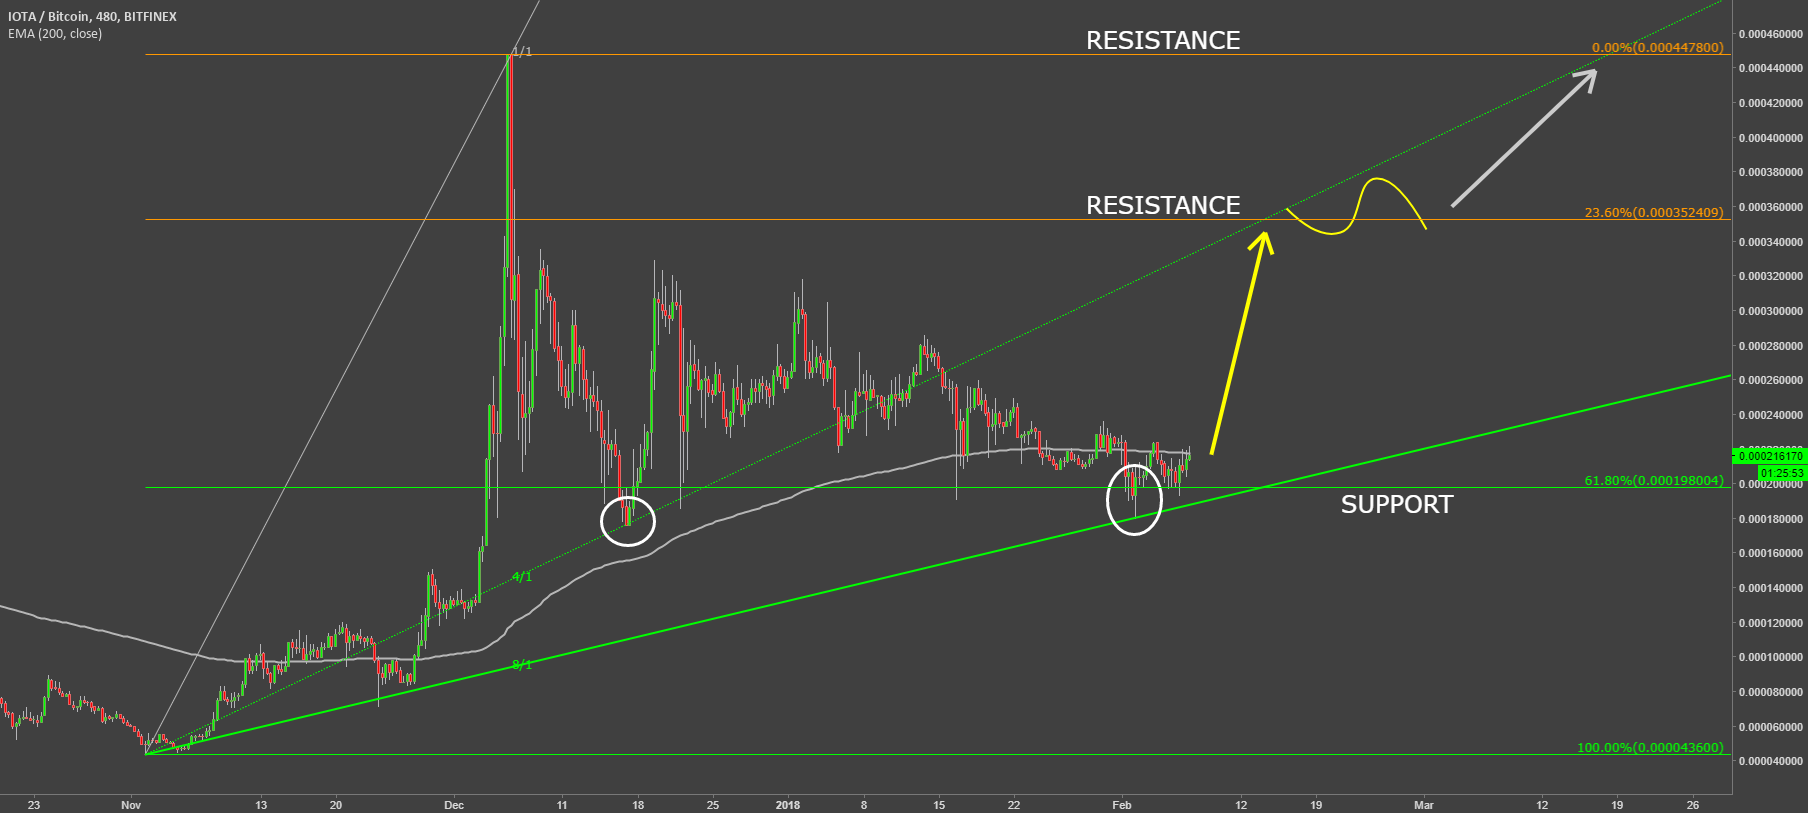 IOTA VS Bitcoin Uptrend Continues